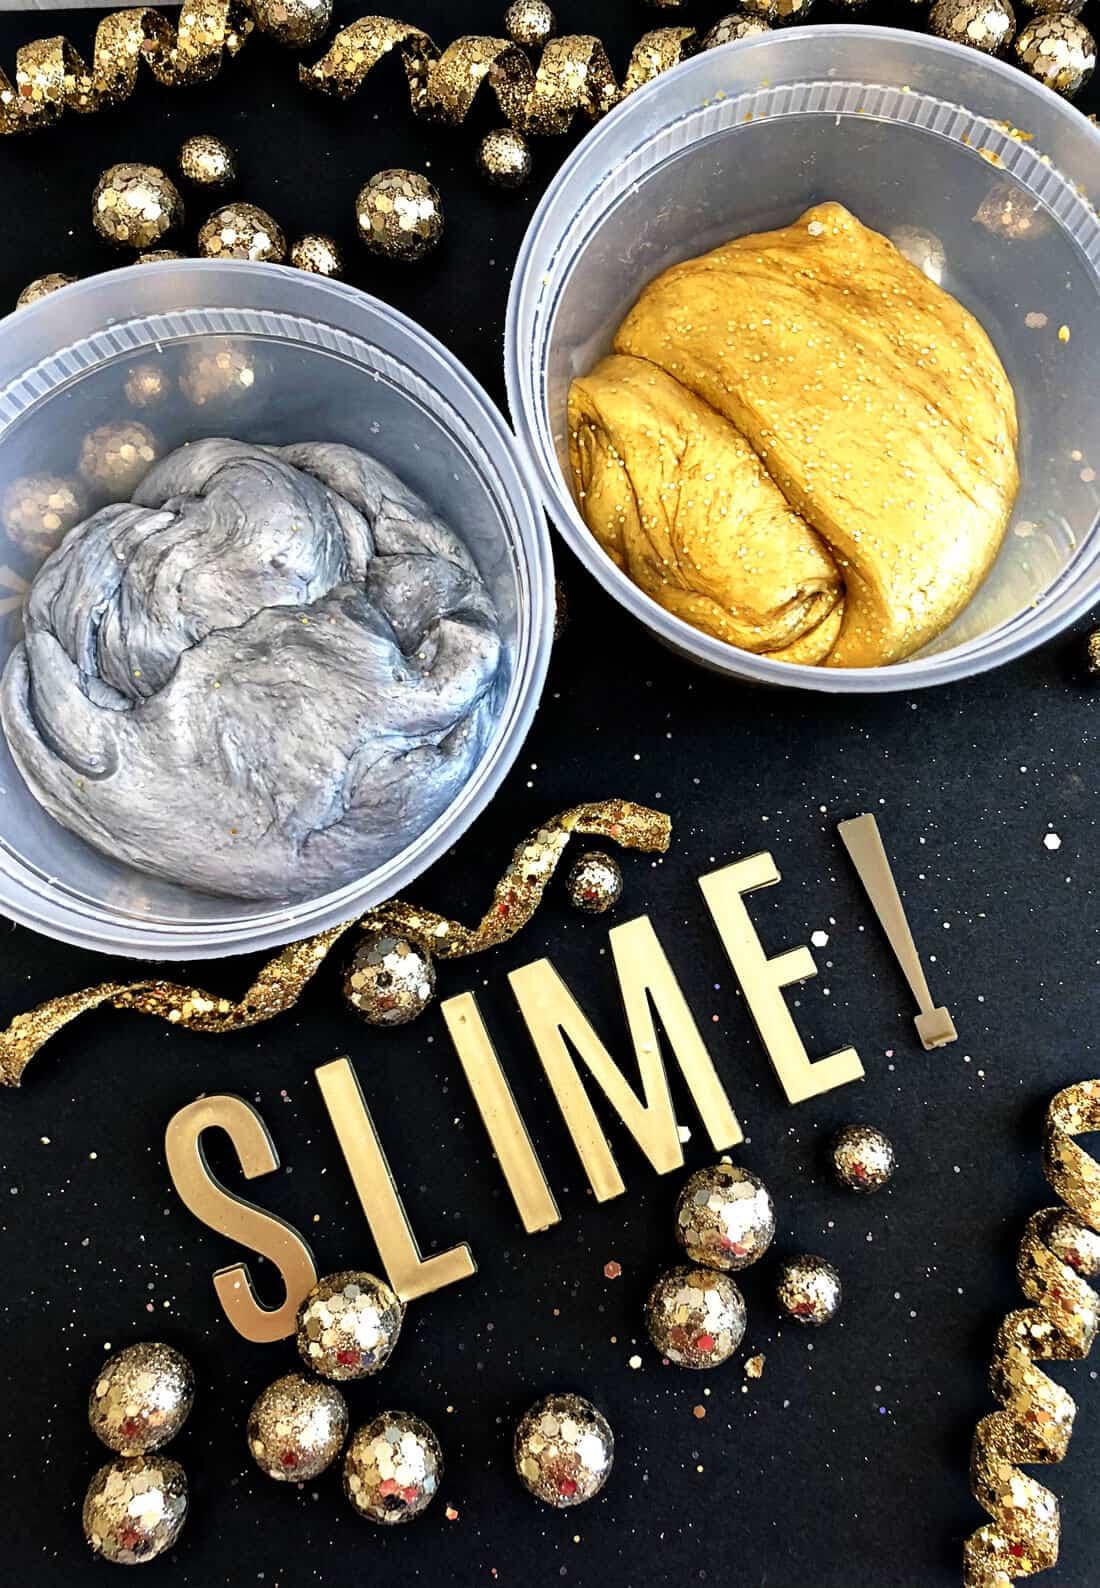 Party slime diy